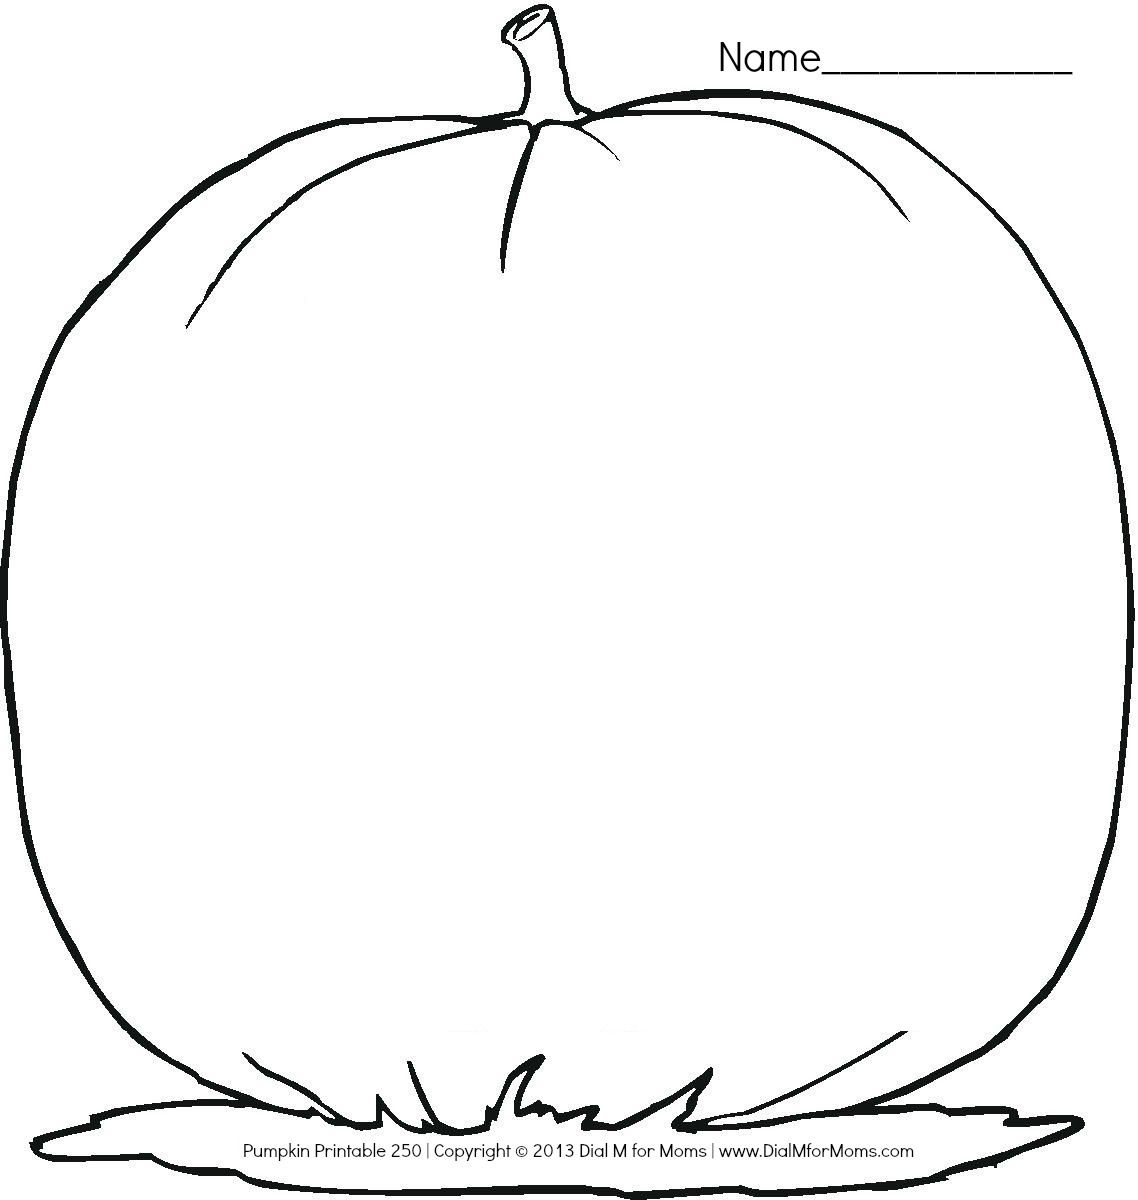 Blank pumpkin template coloring home sketch coloring page for Blank pumpkin coloring page